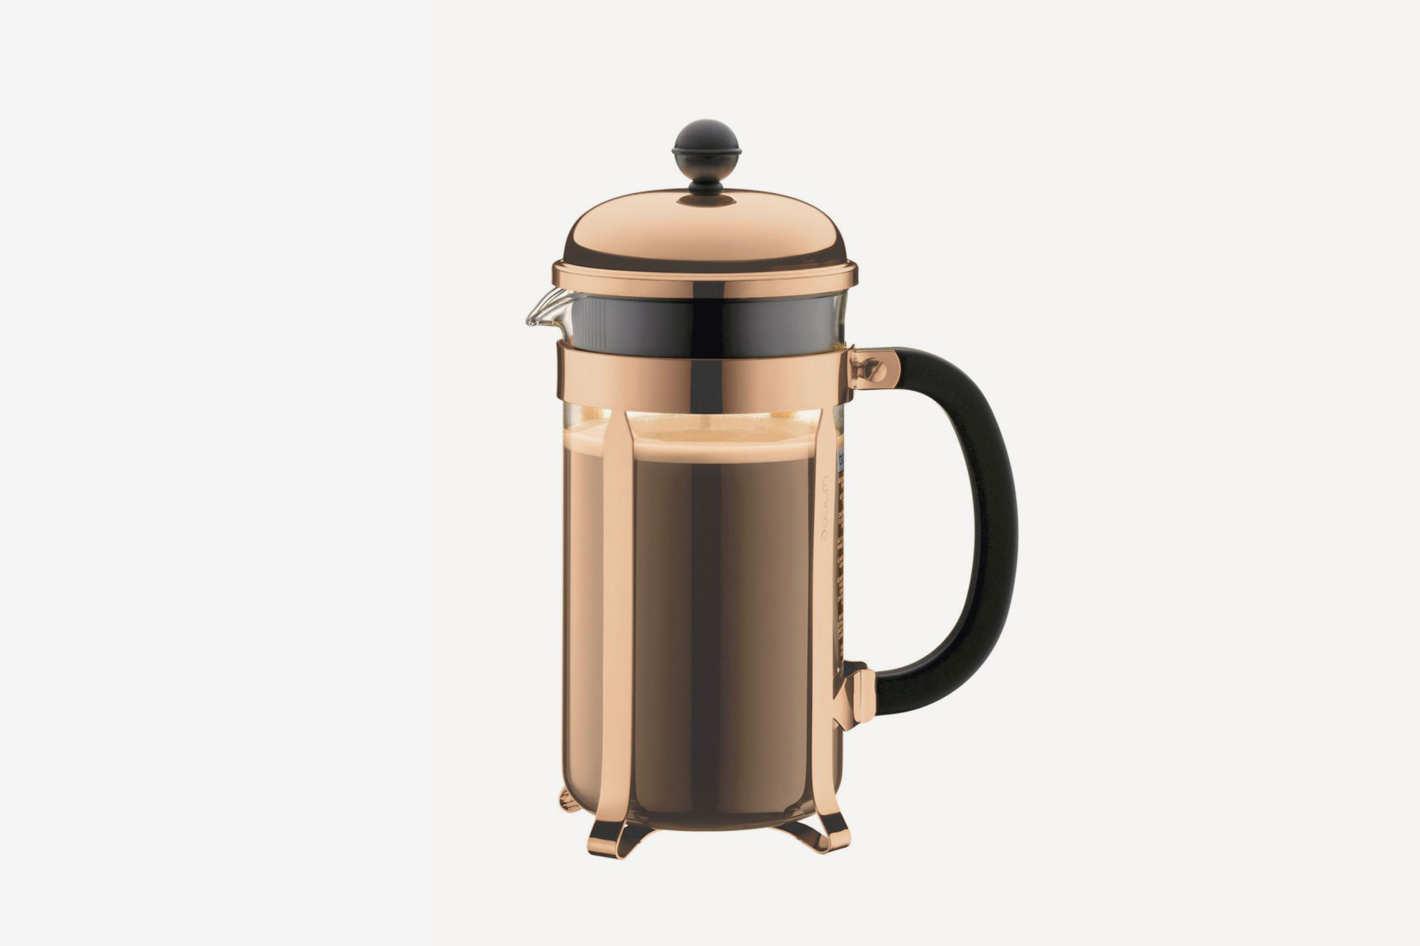 Bodum Chambord Black Top Coffee Maker, 8 Cup